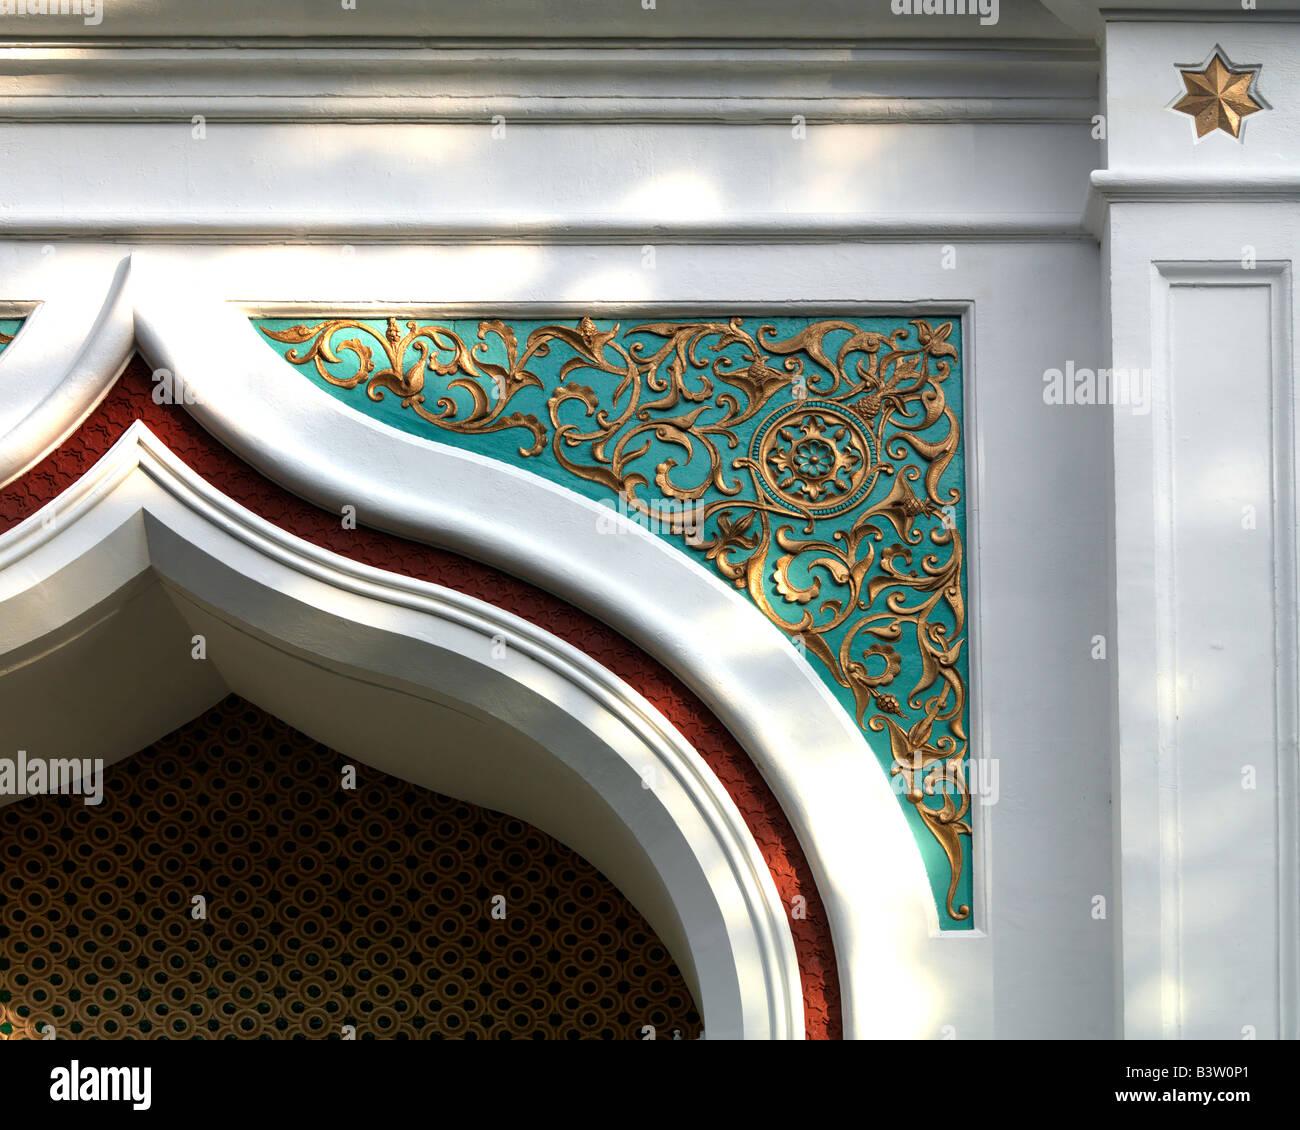 Detail Of Shah Jahan Mosque Woking Surrey - Stock Image